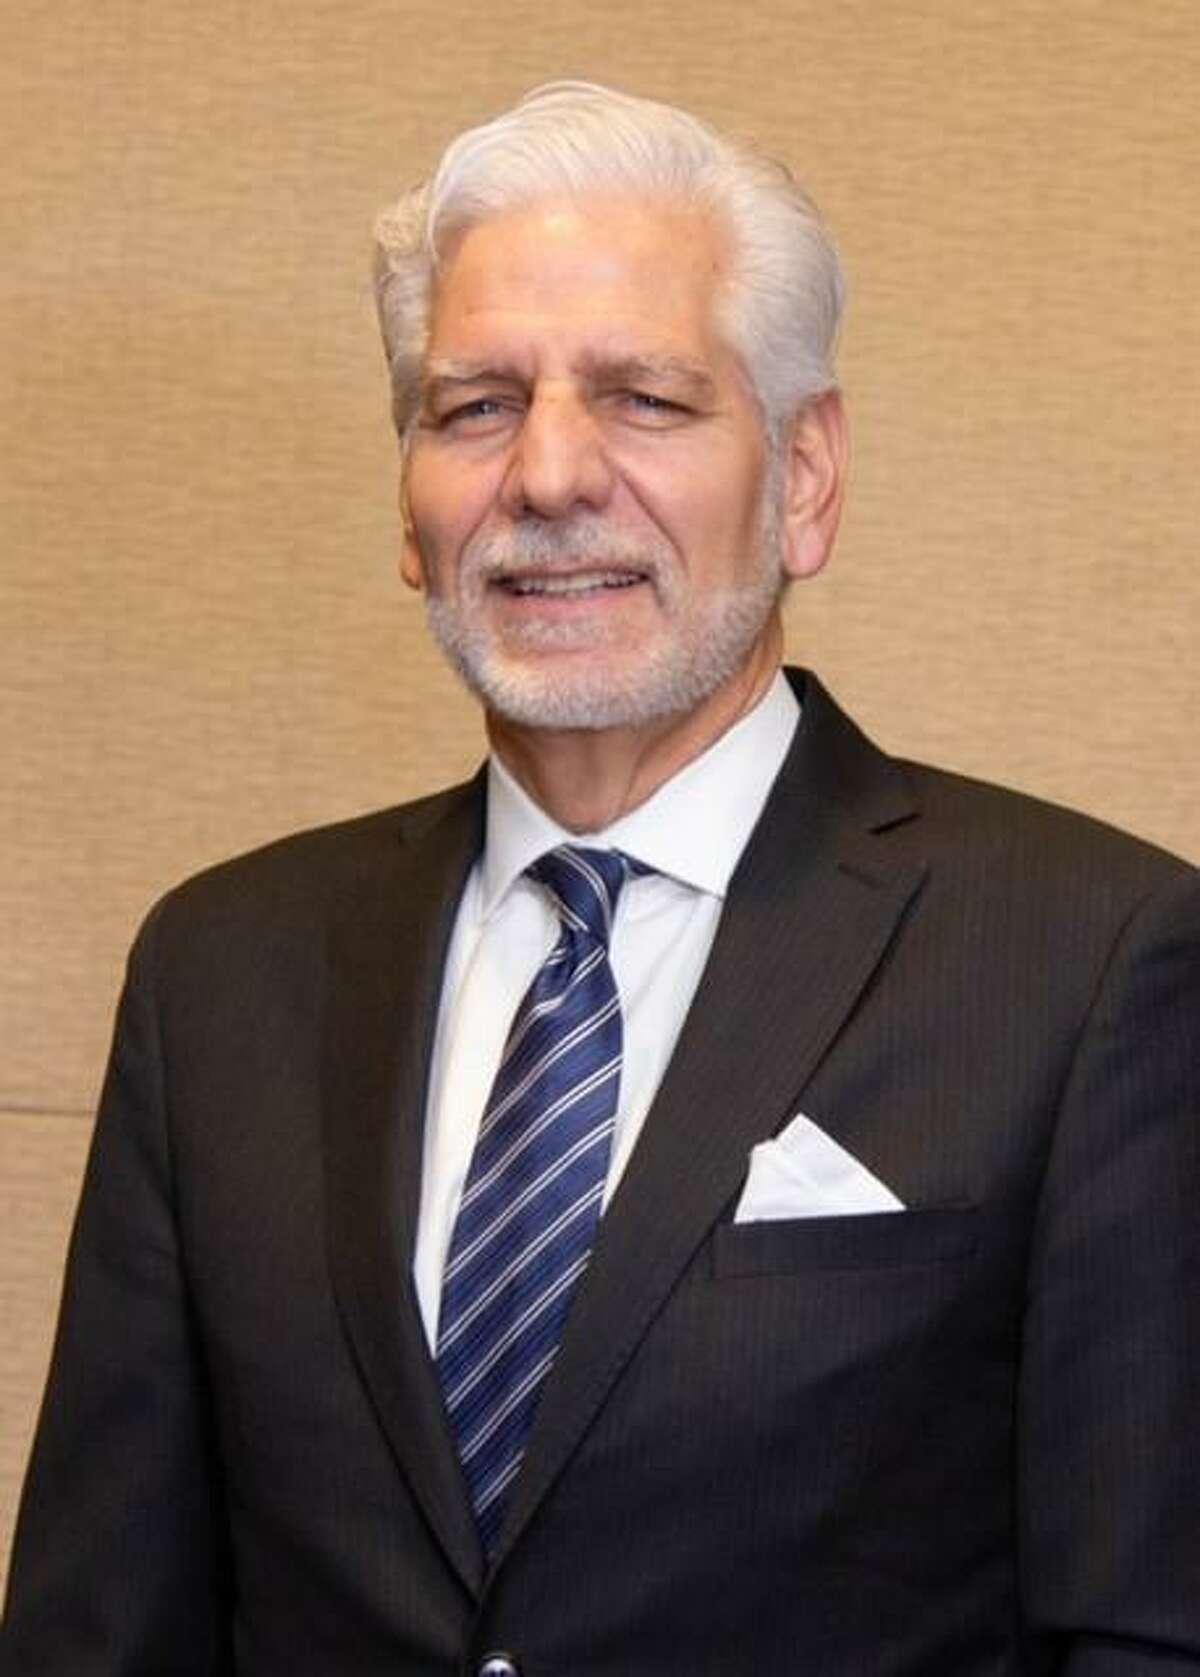 Vincent DiCosimo, senior vice president, petroleum logistics at Targa Resources, will speak at the Greater Houston Port Bureau meeting on Thursday.